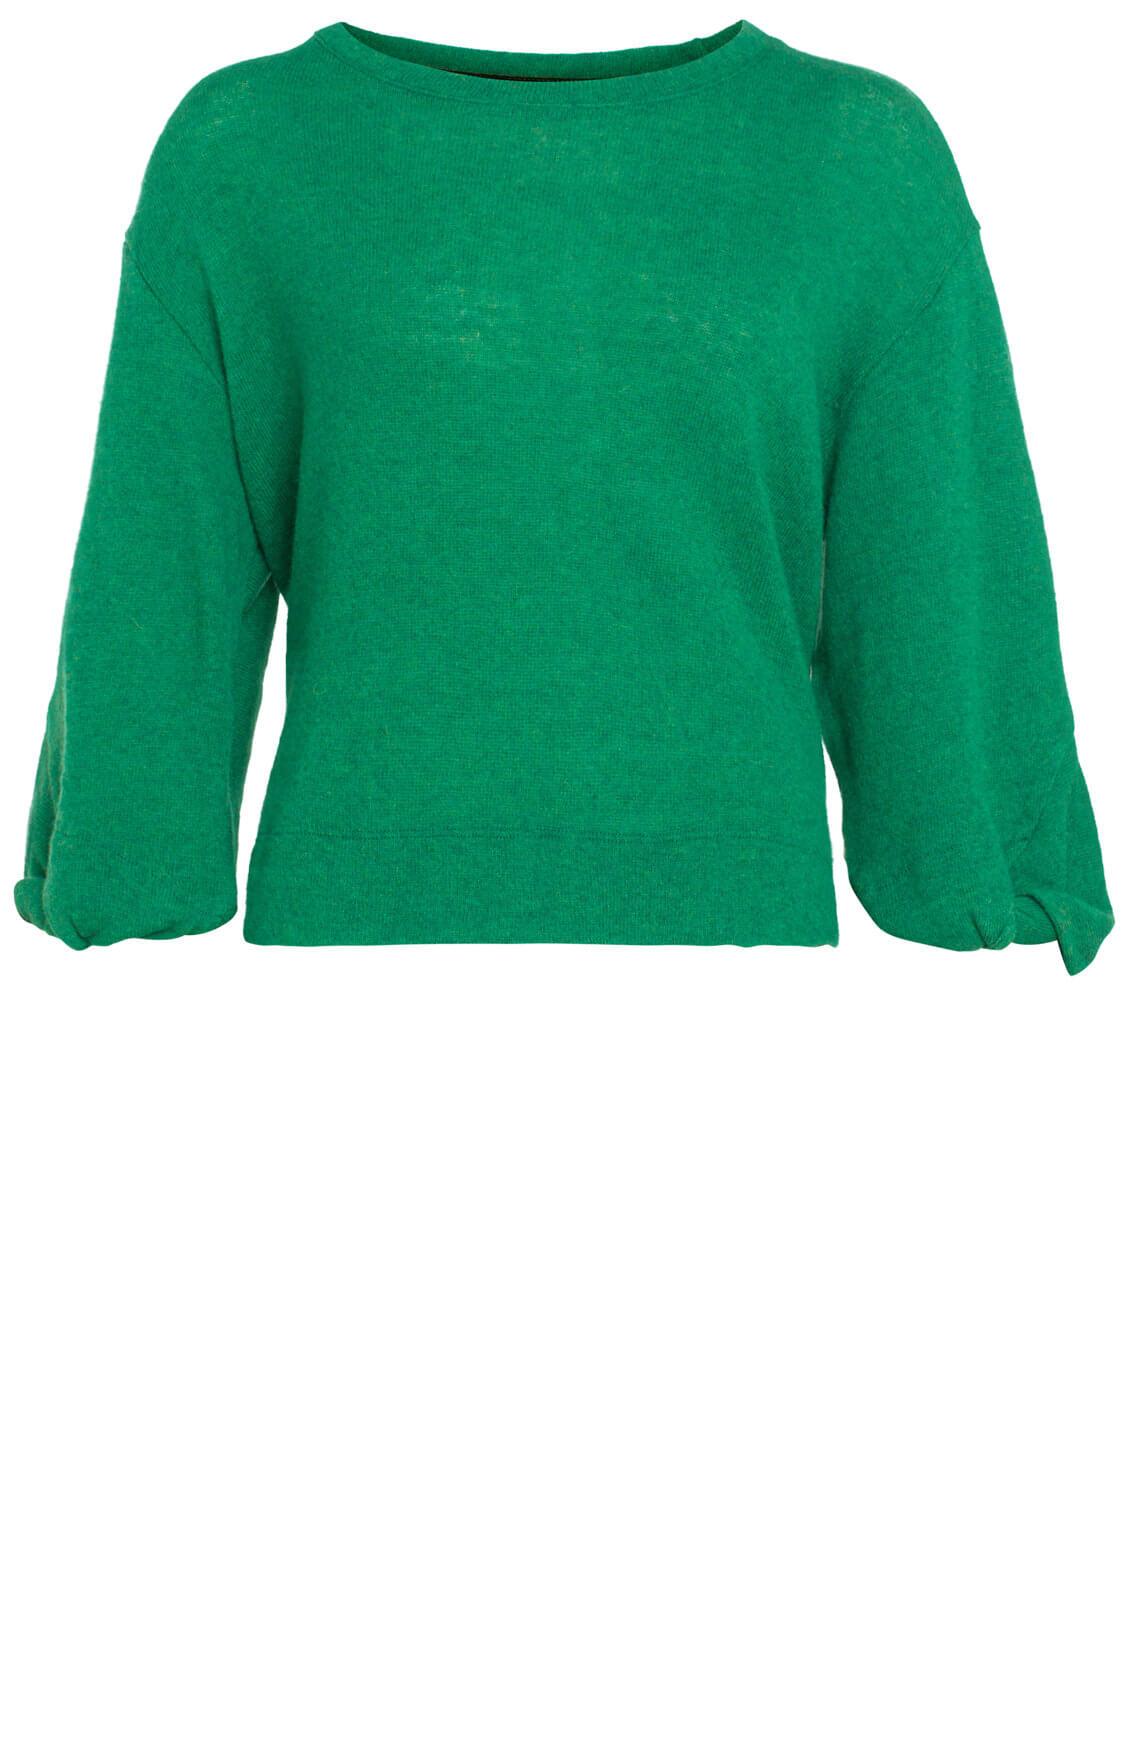 La Fée Maraboutée Dames Fijngebreide pullover groen groen